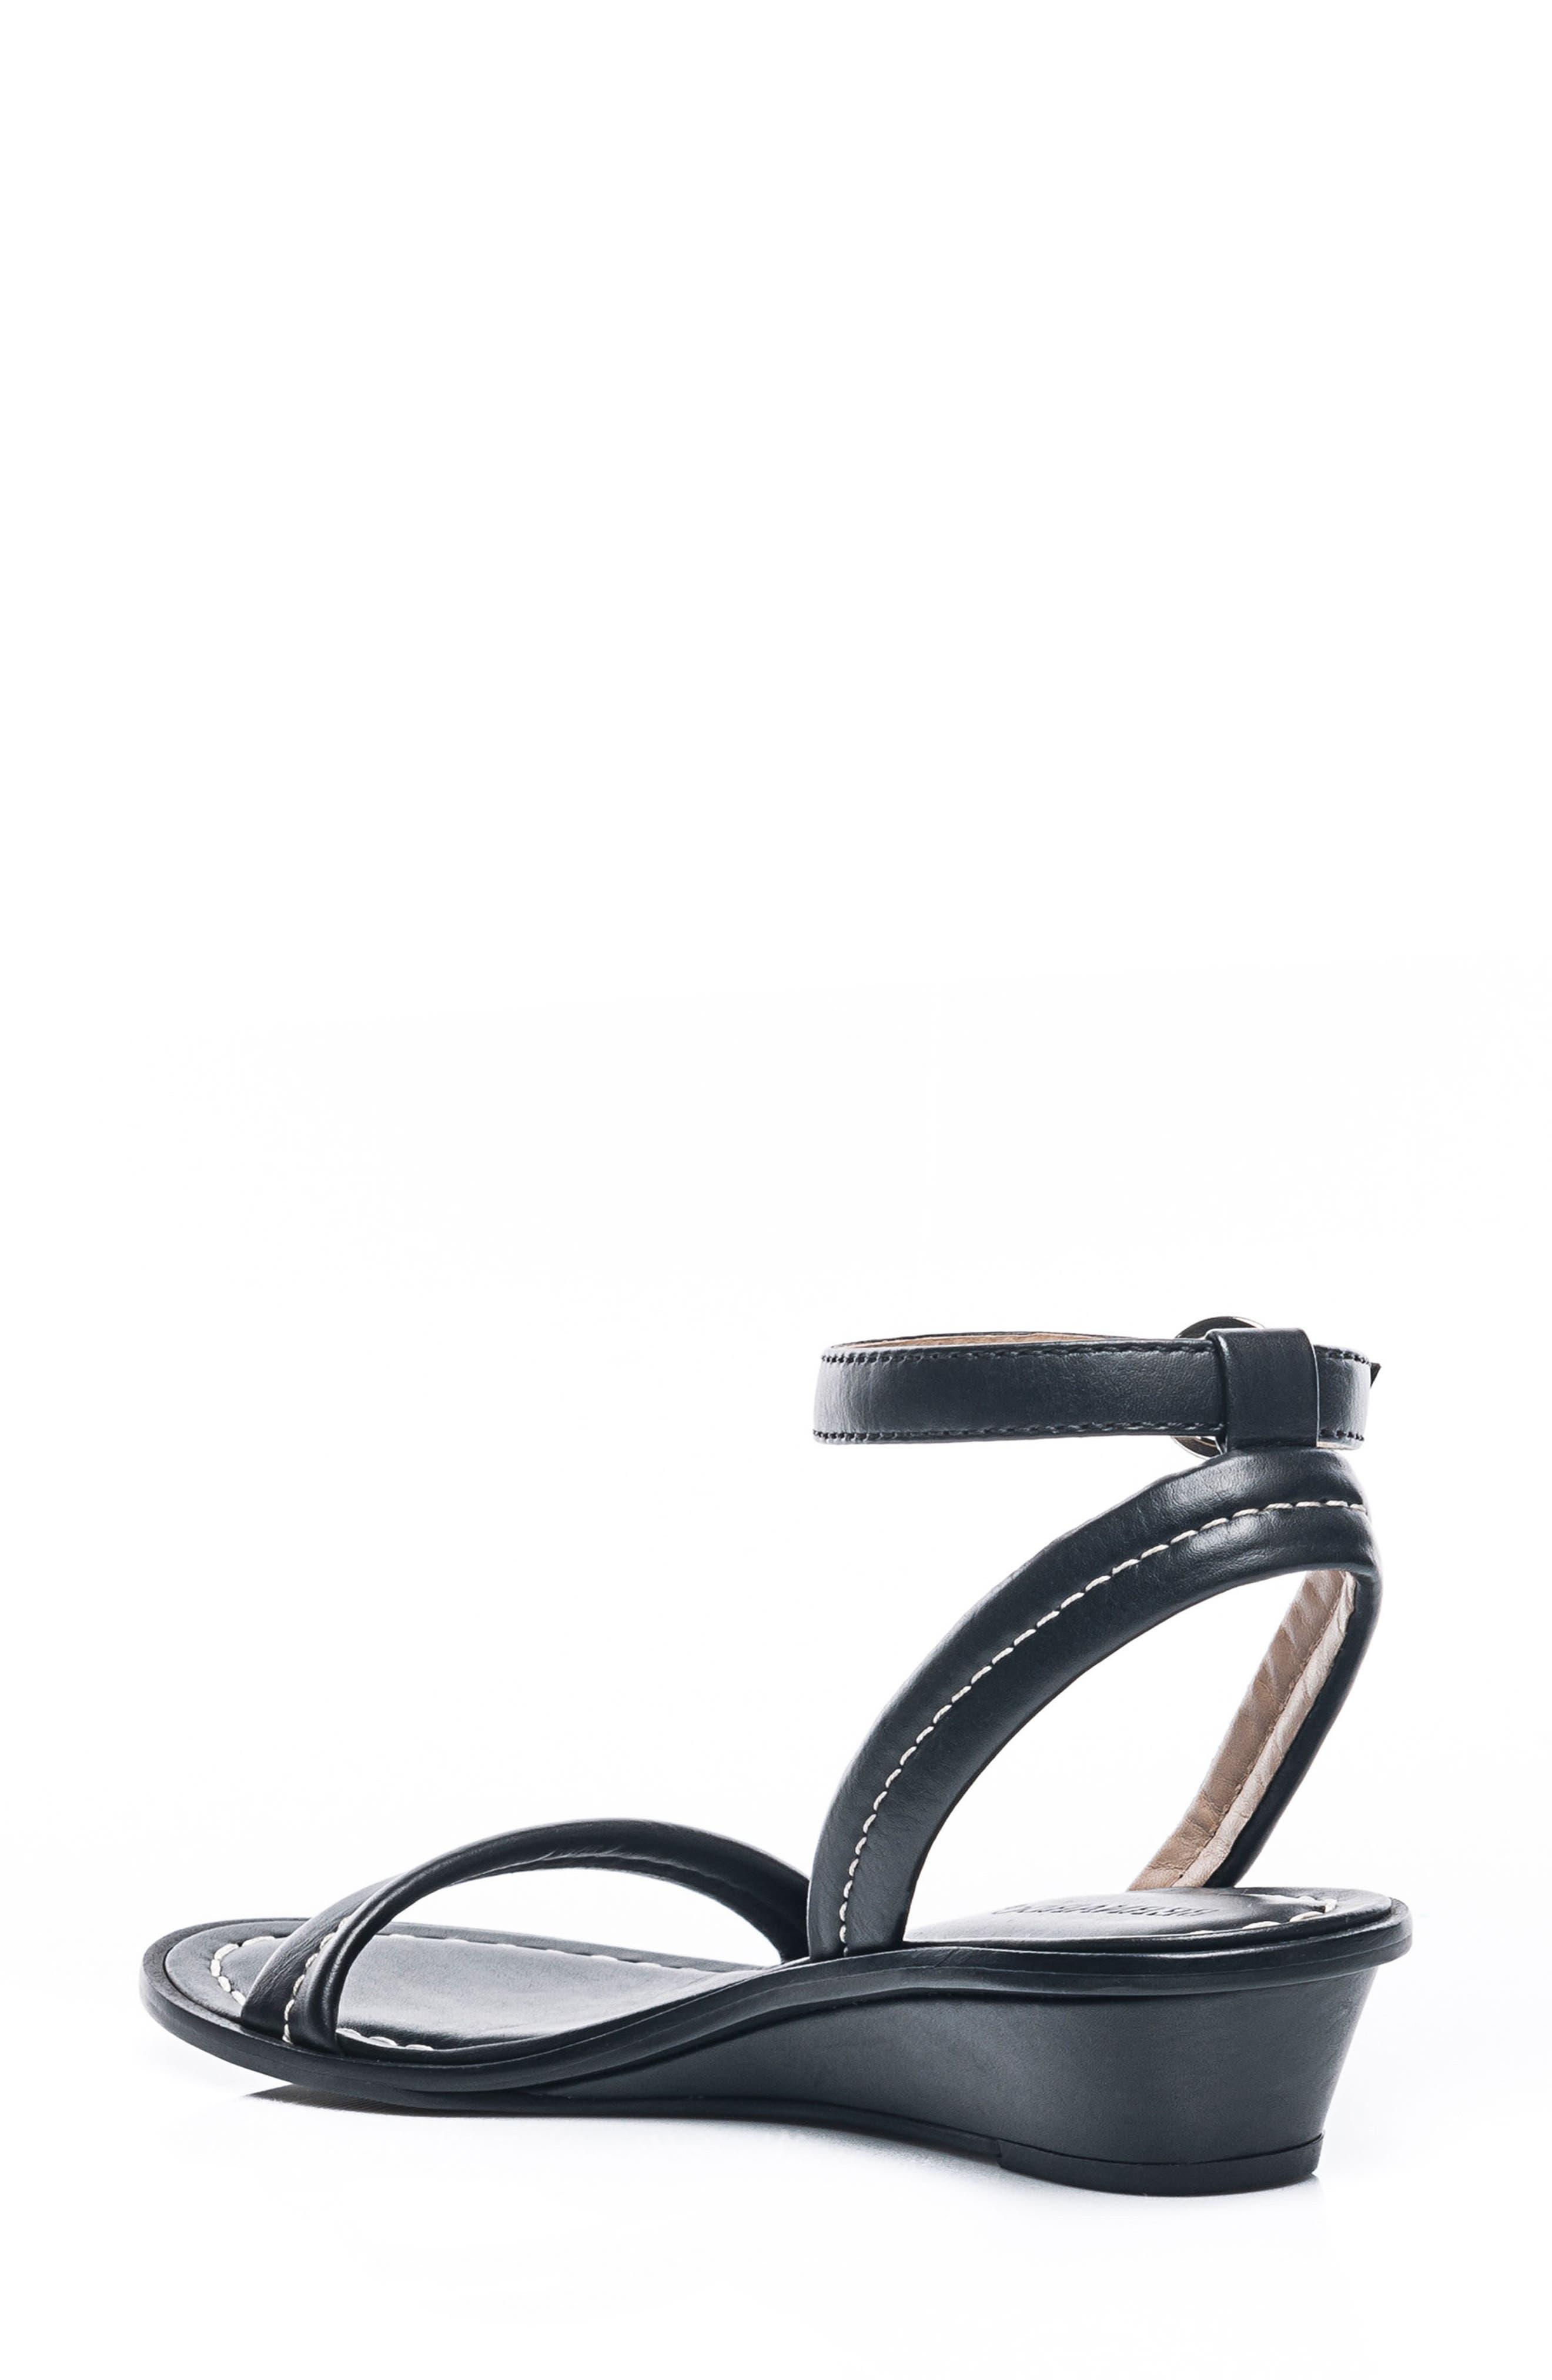 Bernardo Catherine Ankle Strap Sandal,                             Alternate thumbnail 2, color,                             Black Antique